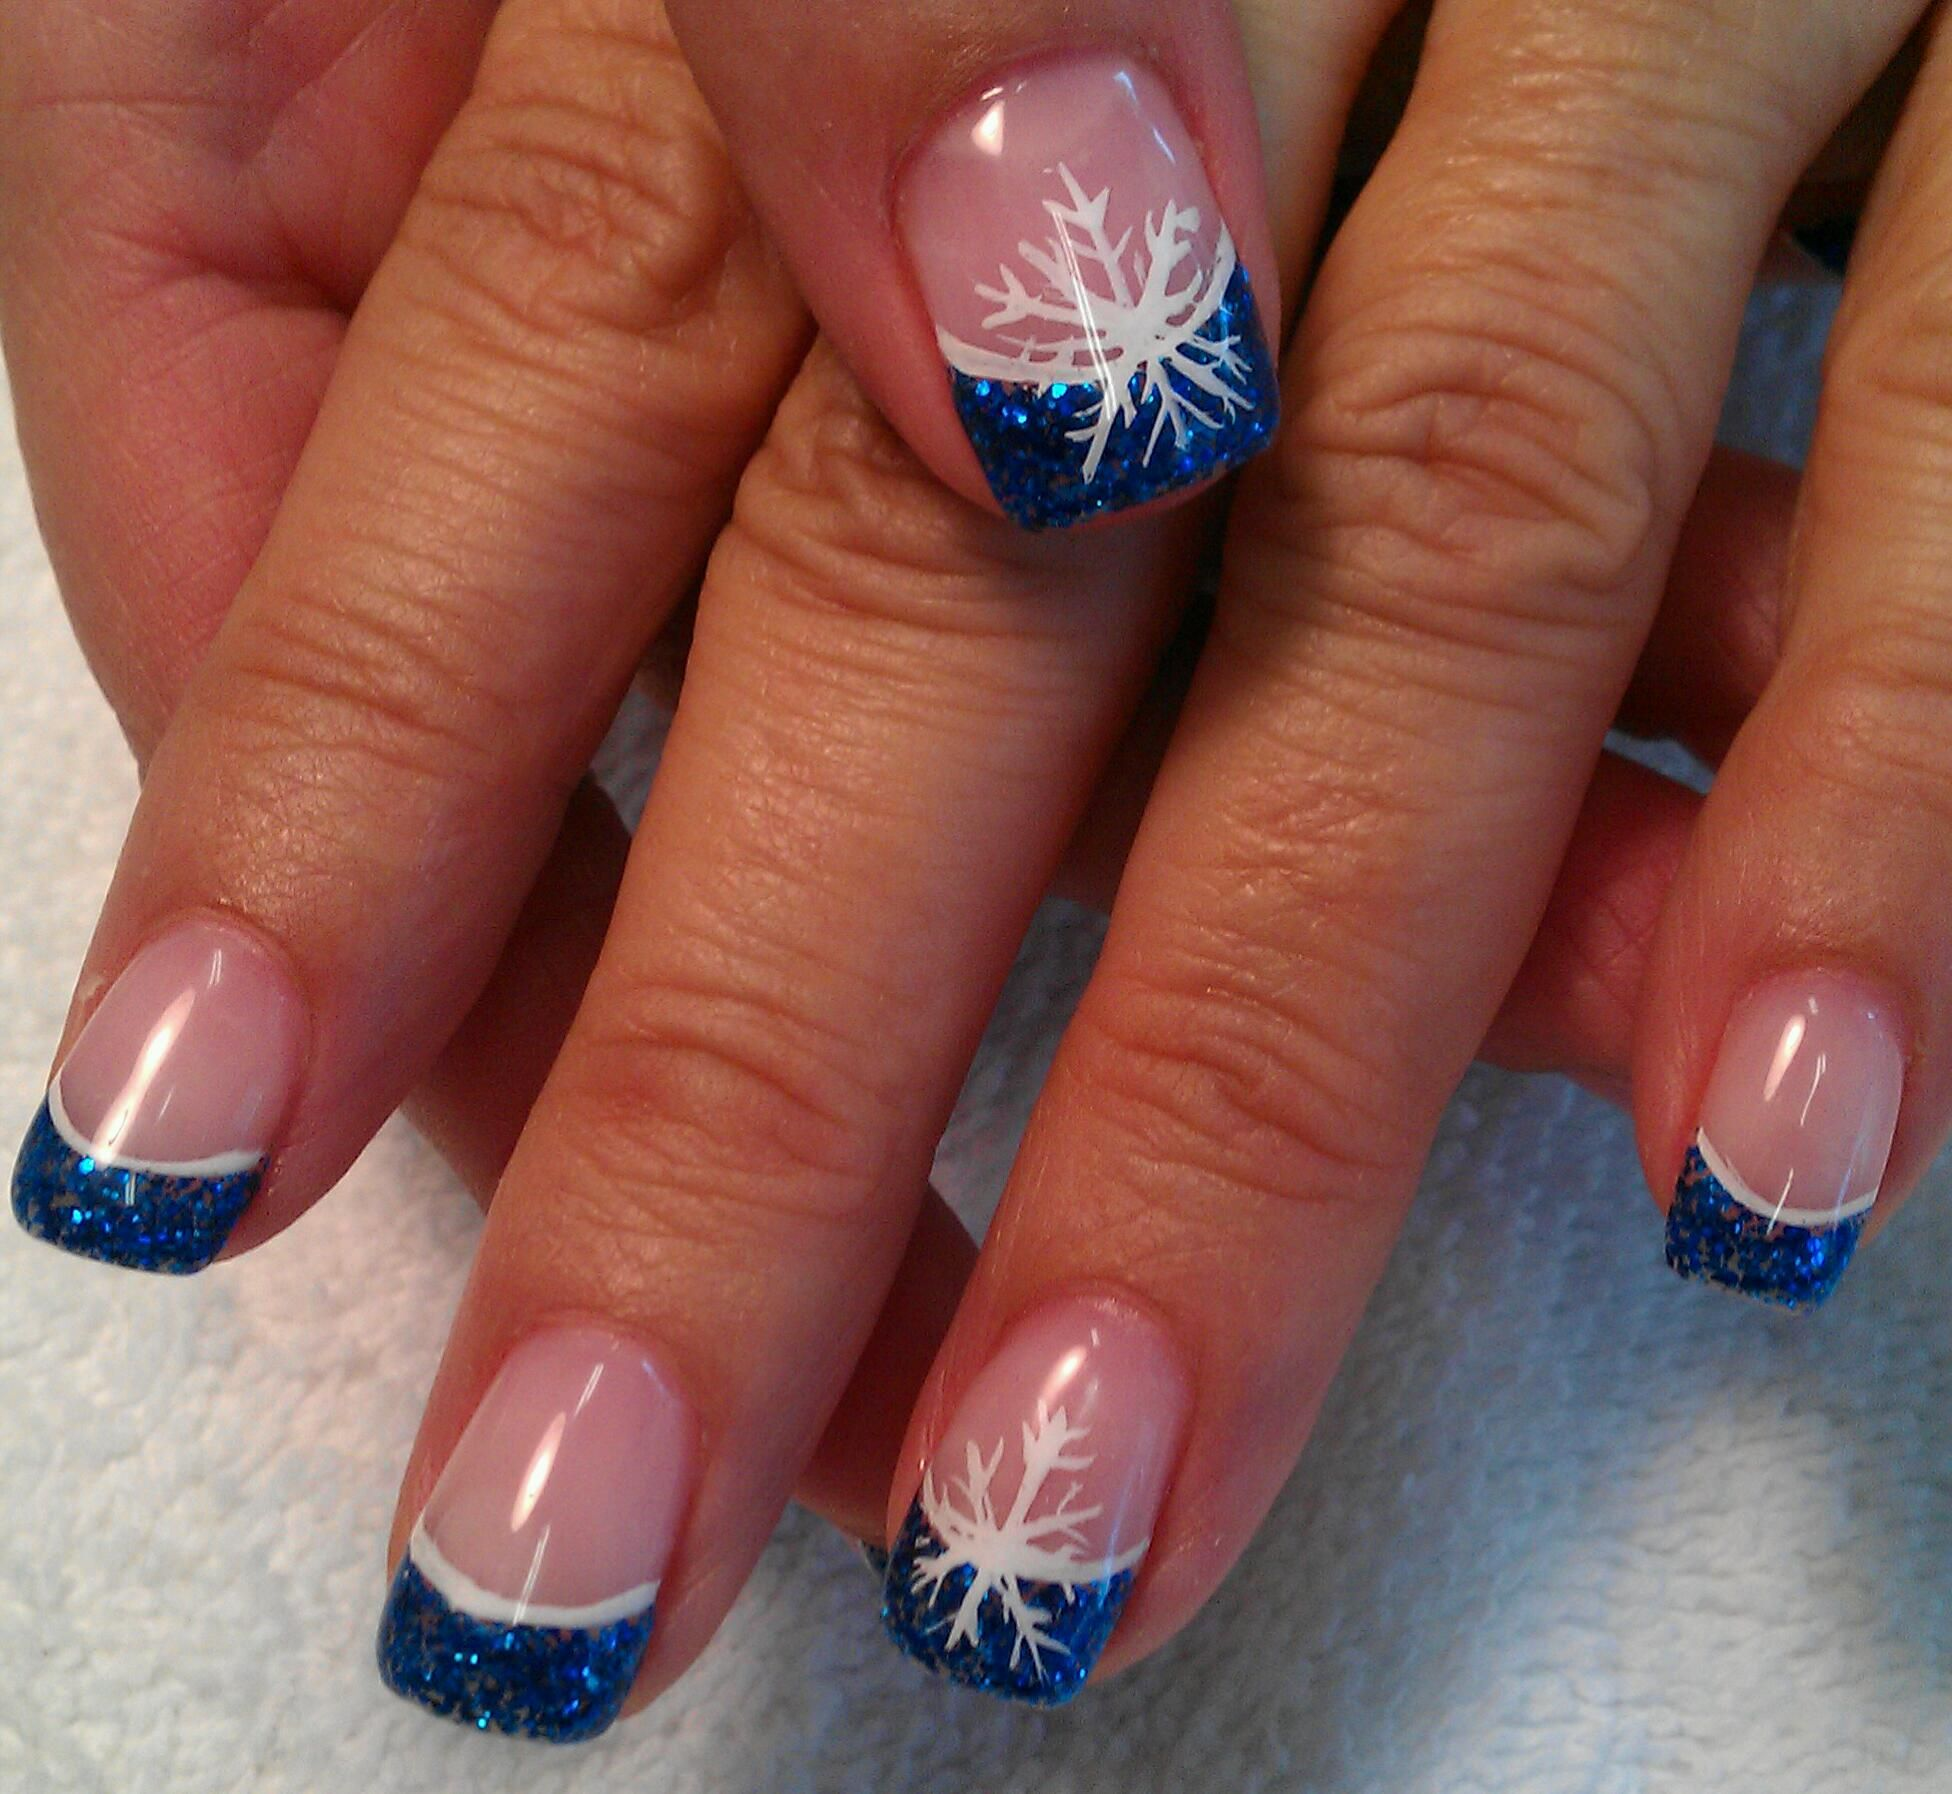 Ideas For Christmas Gel Nails: Light Elegance Gel: Brilliant Blue Glitter Gel NAILS